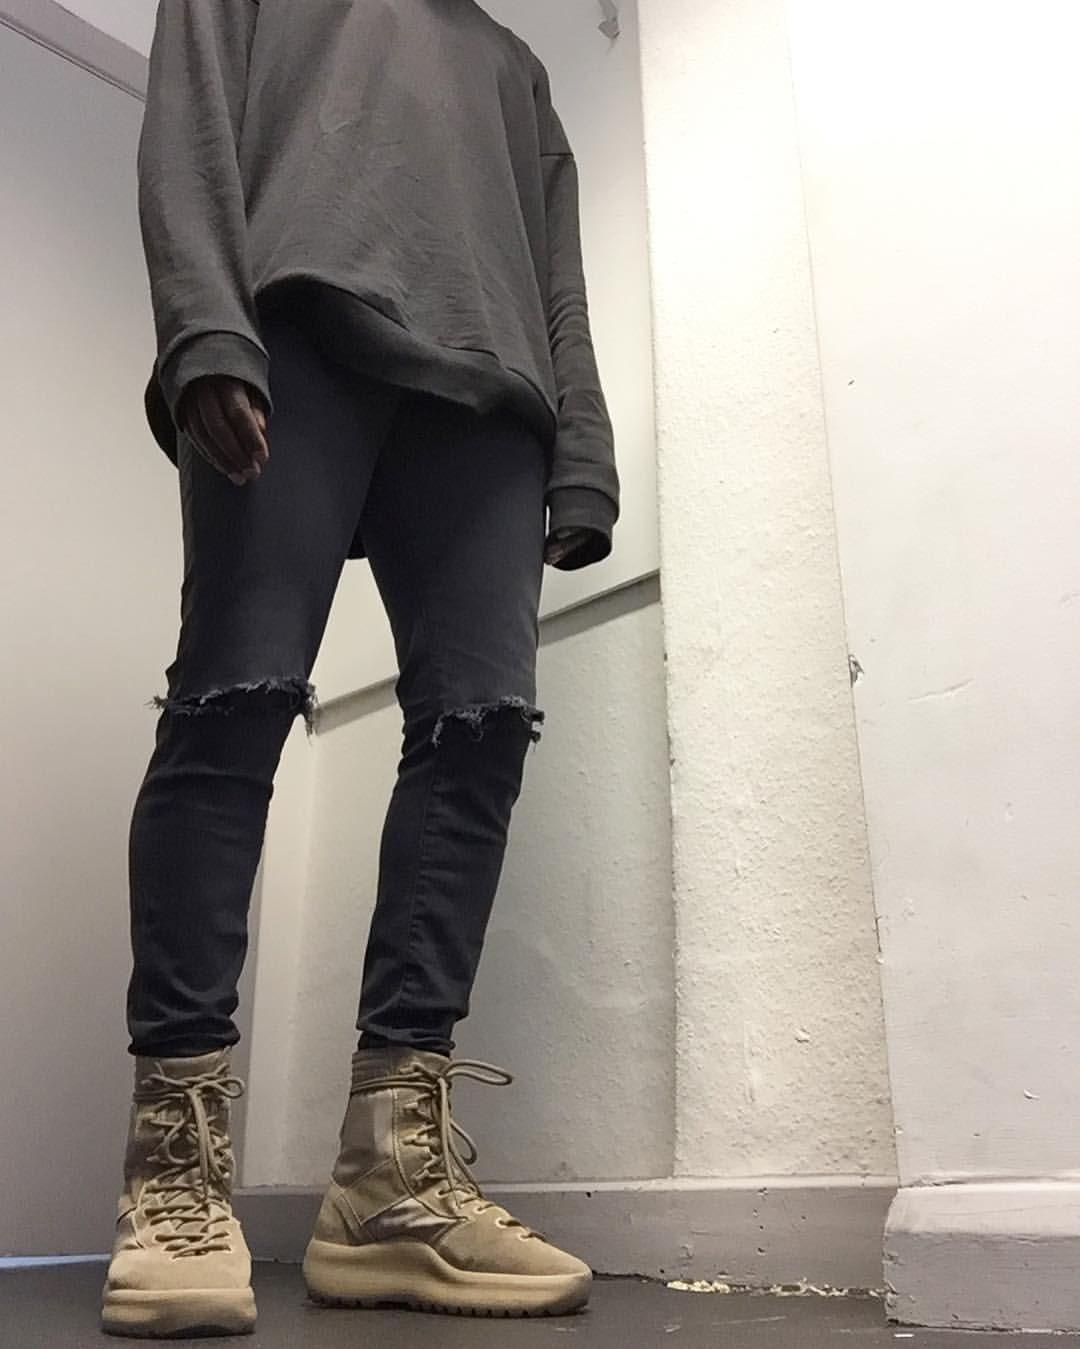 165b3689552c4 Yeezy military boots